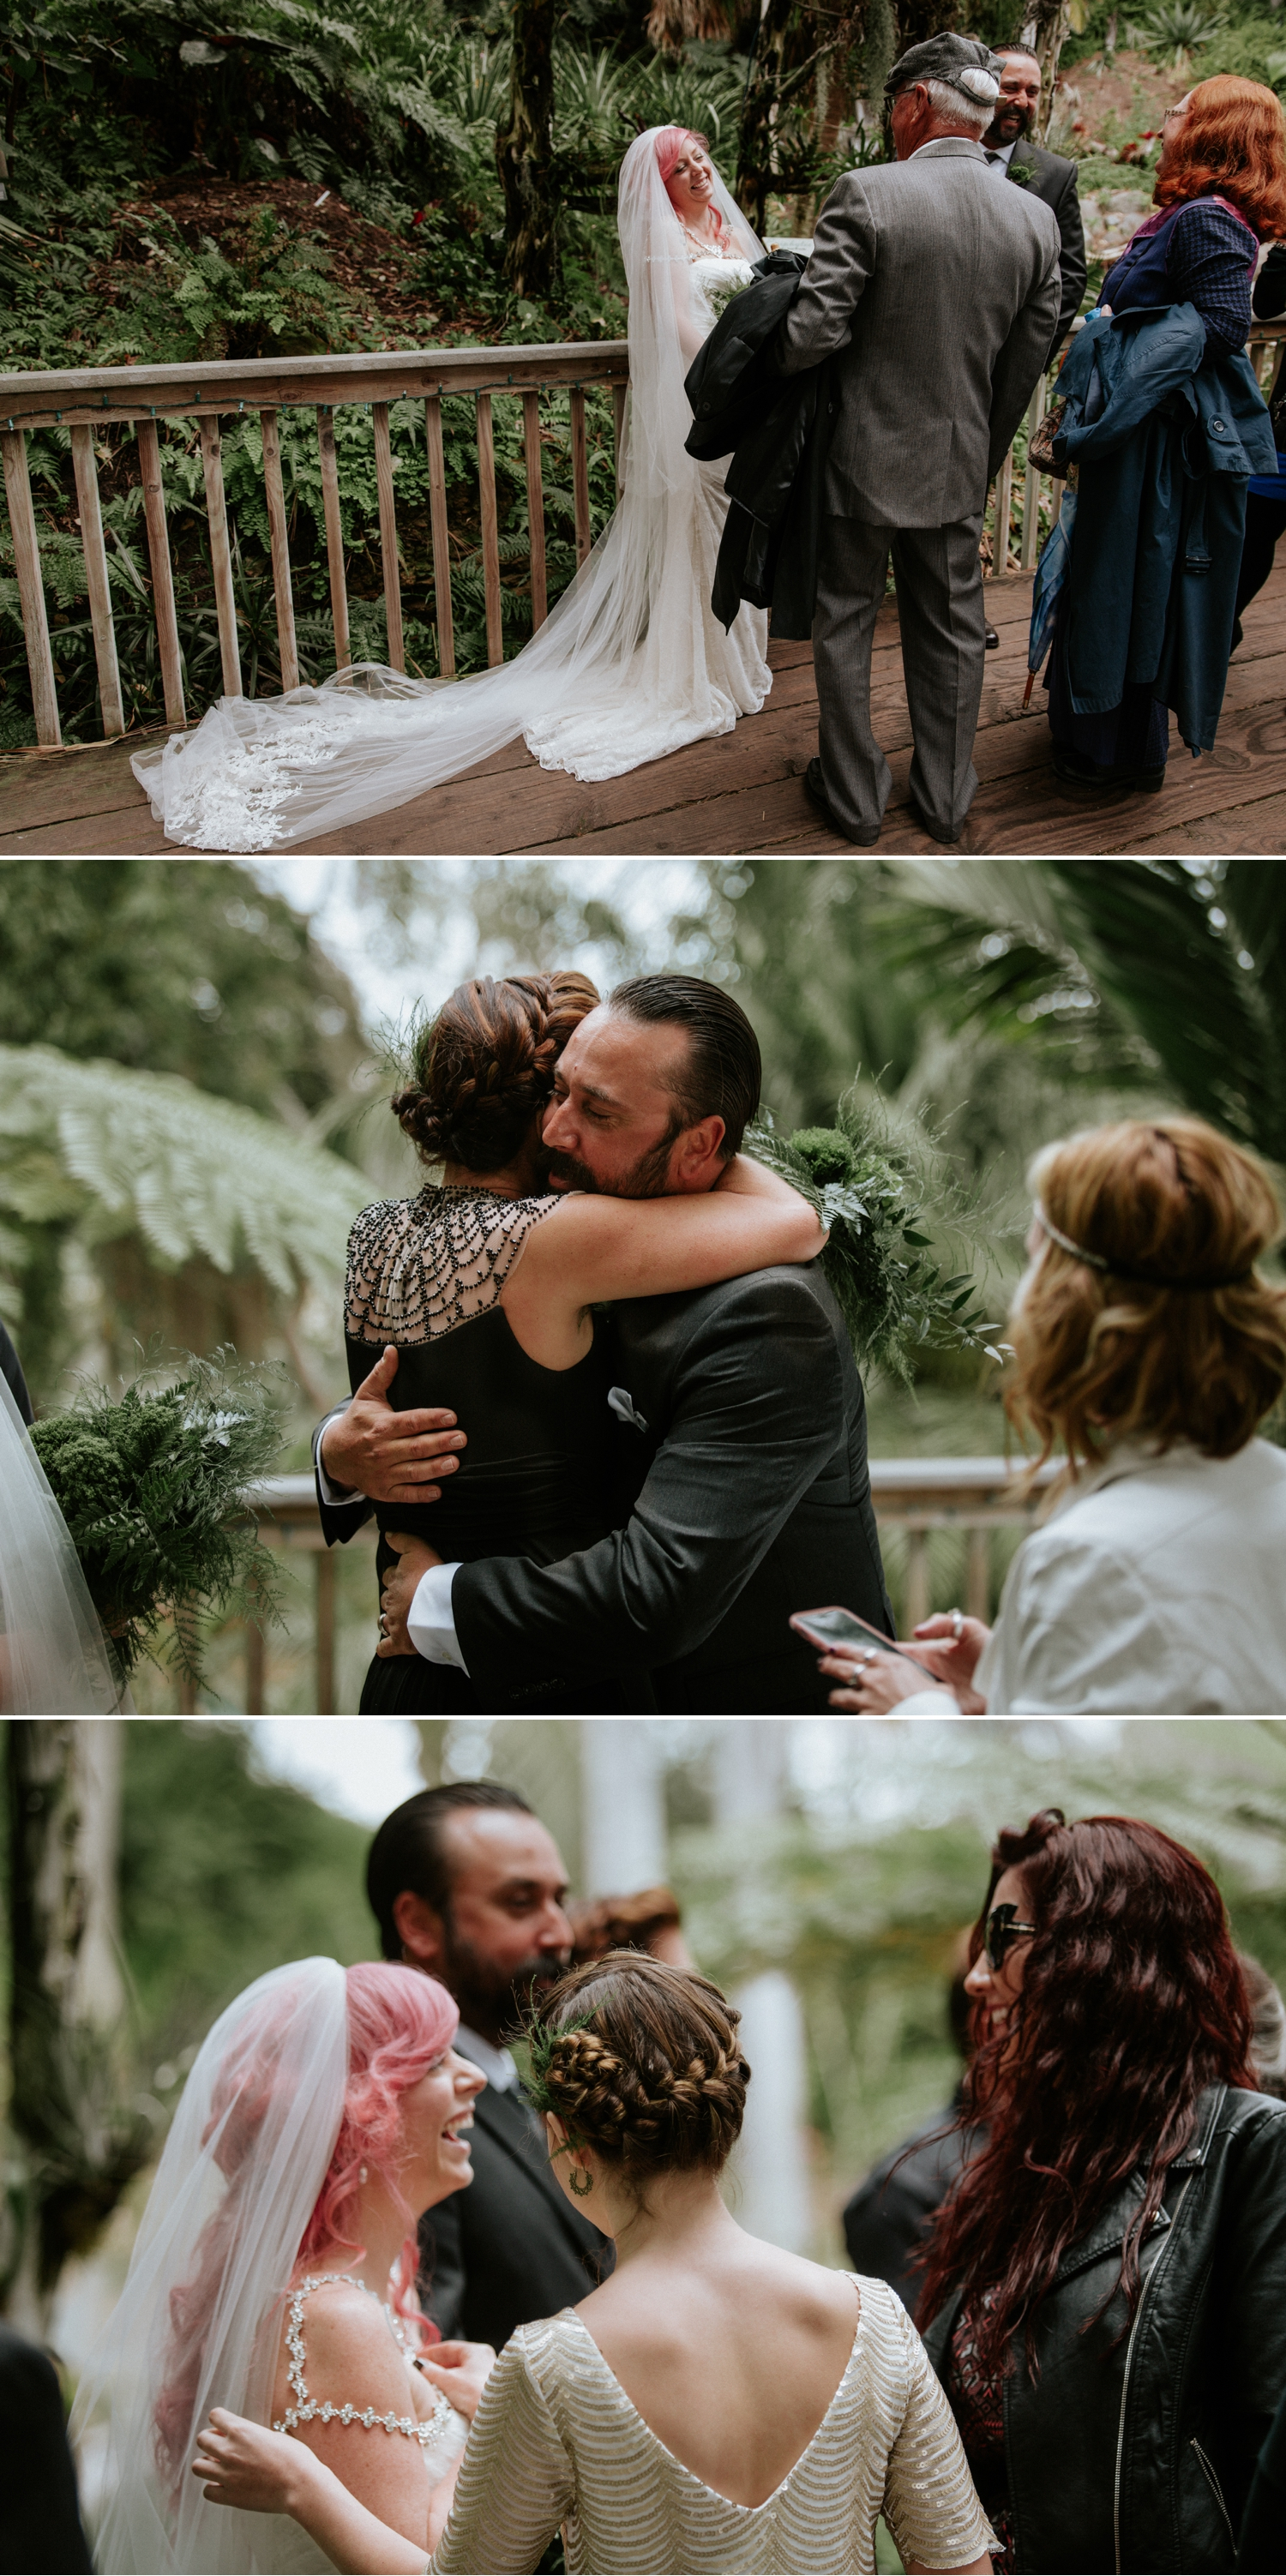 Intimate wedding at San Diego Botanic Garden by Paige Nelson